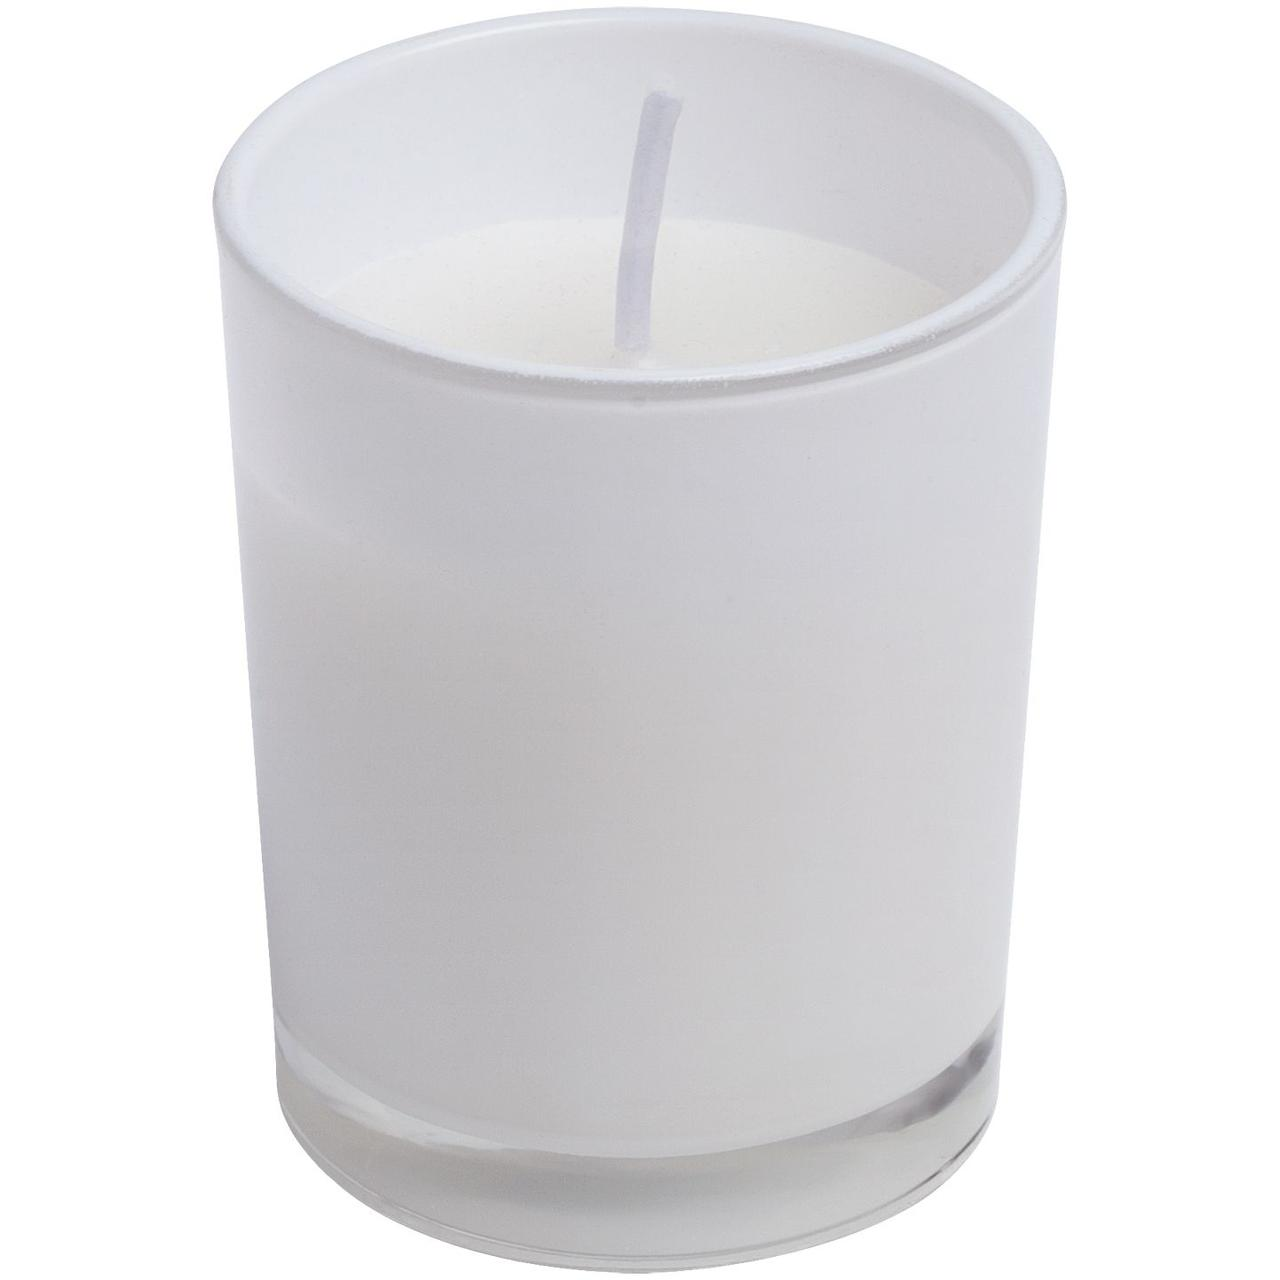 Свеча Glimmy, белая (артикул 7697.66)